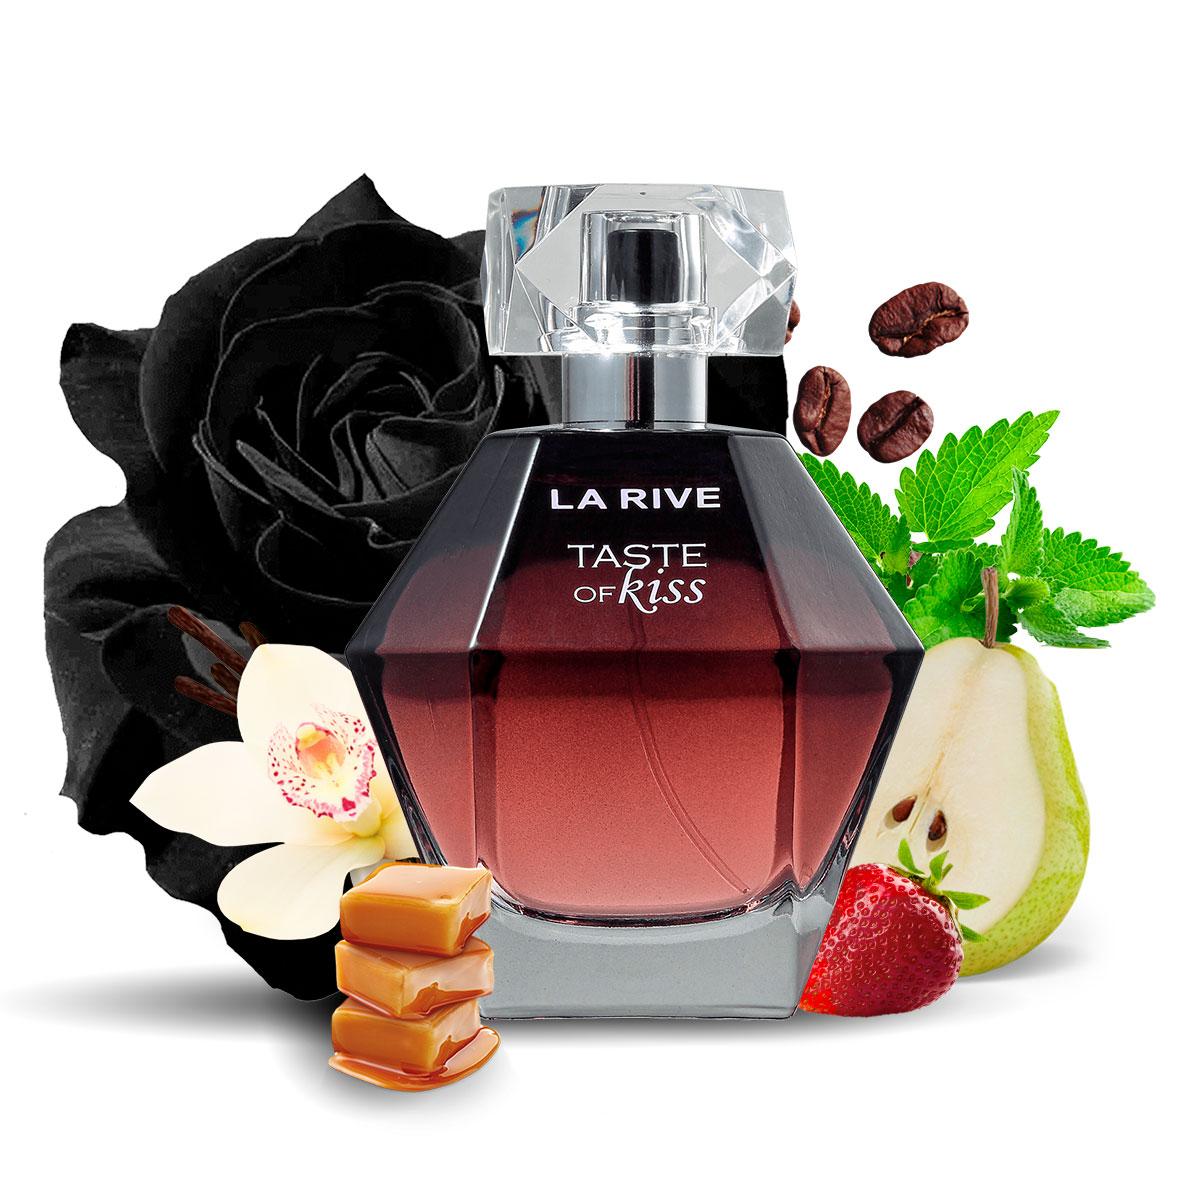 Kit 2 Perfumes Importados Ironstone e Taste of Kiss La Rive  - Mercari Perfumes